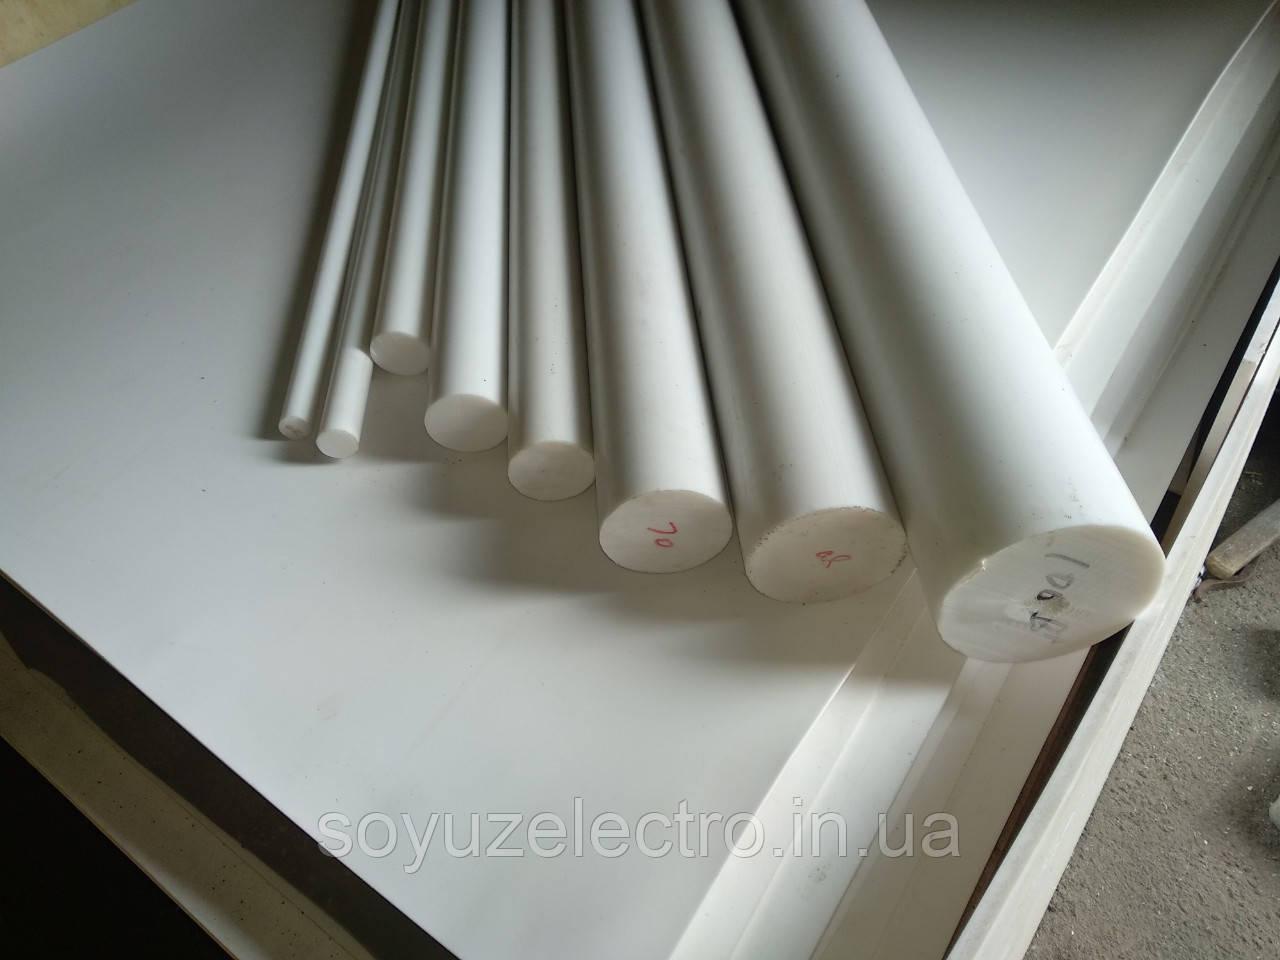 Фторопласт стержень Ф4 10-200 мм